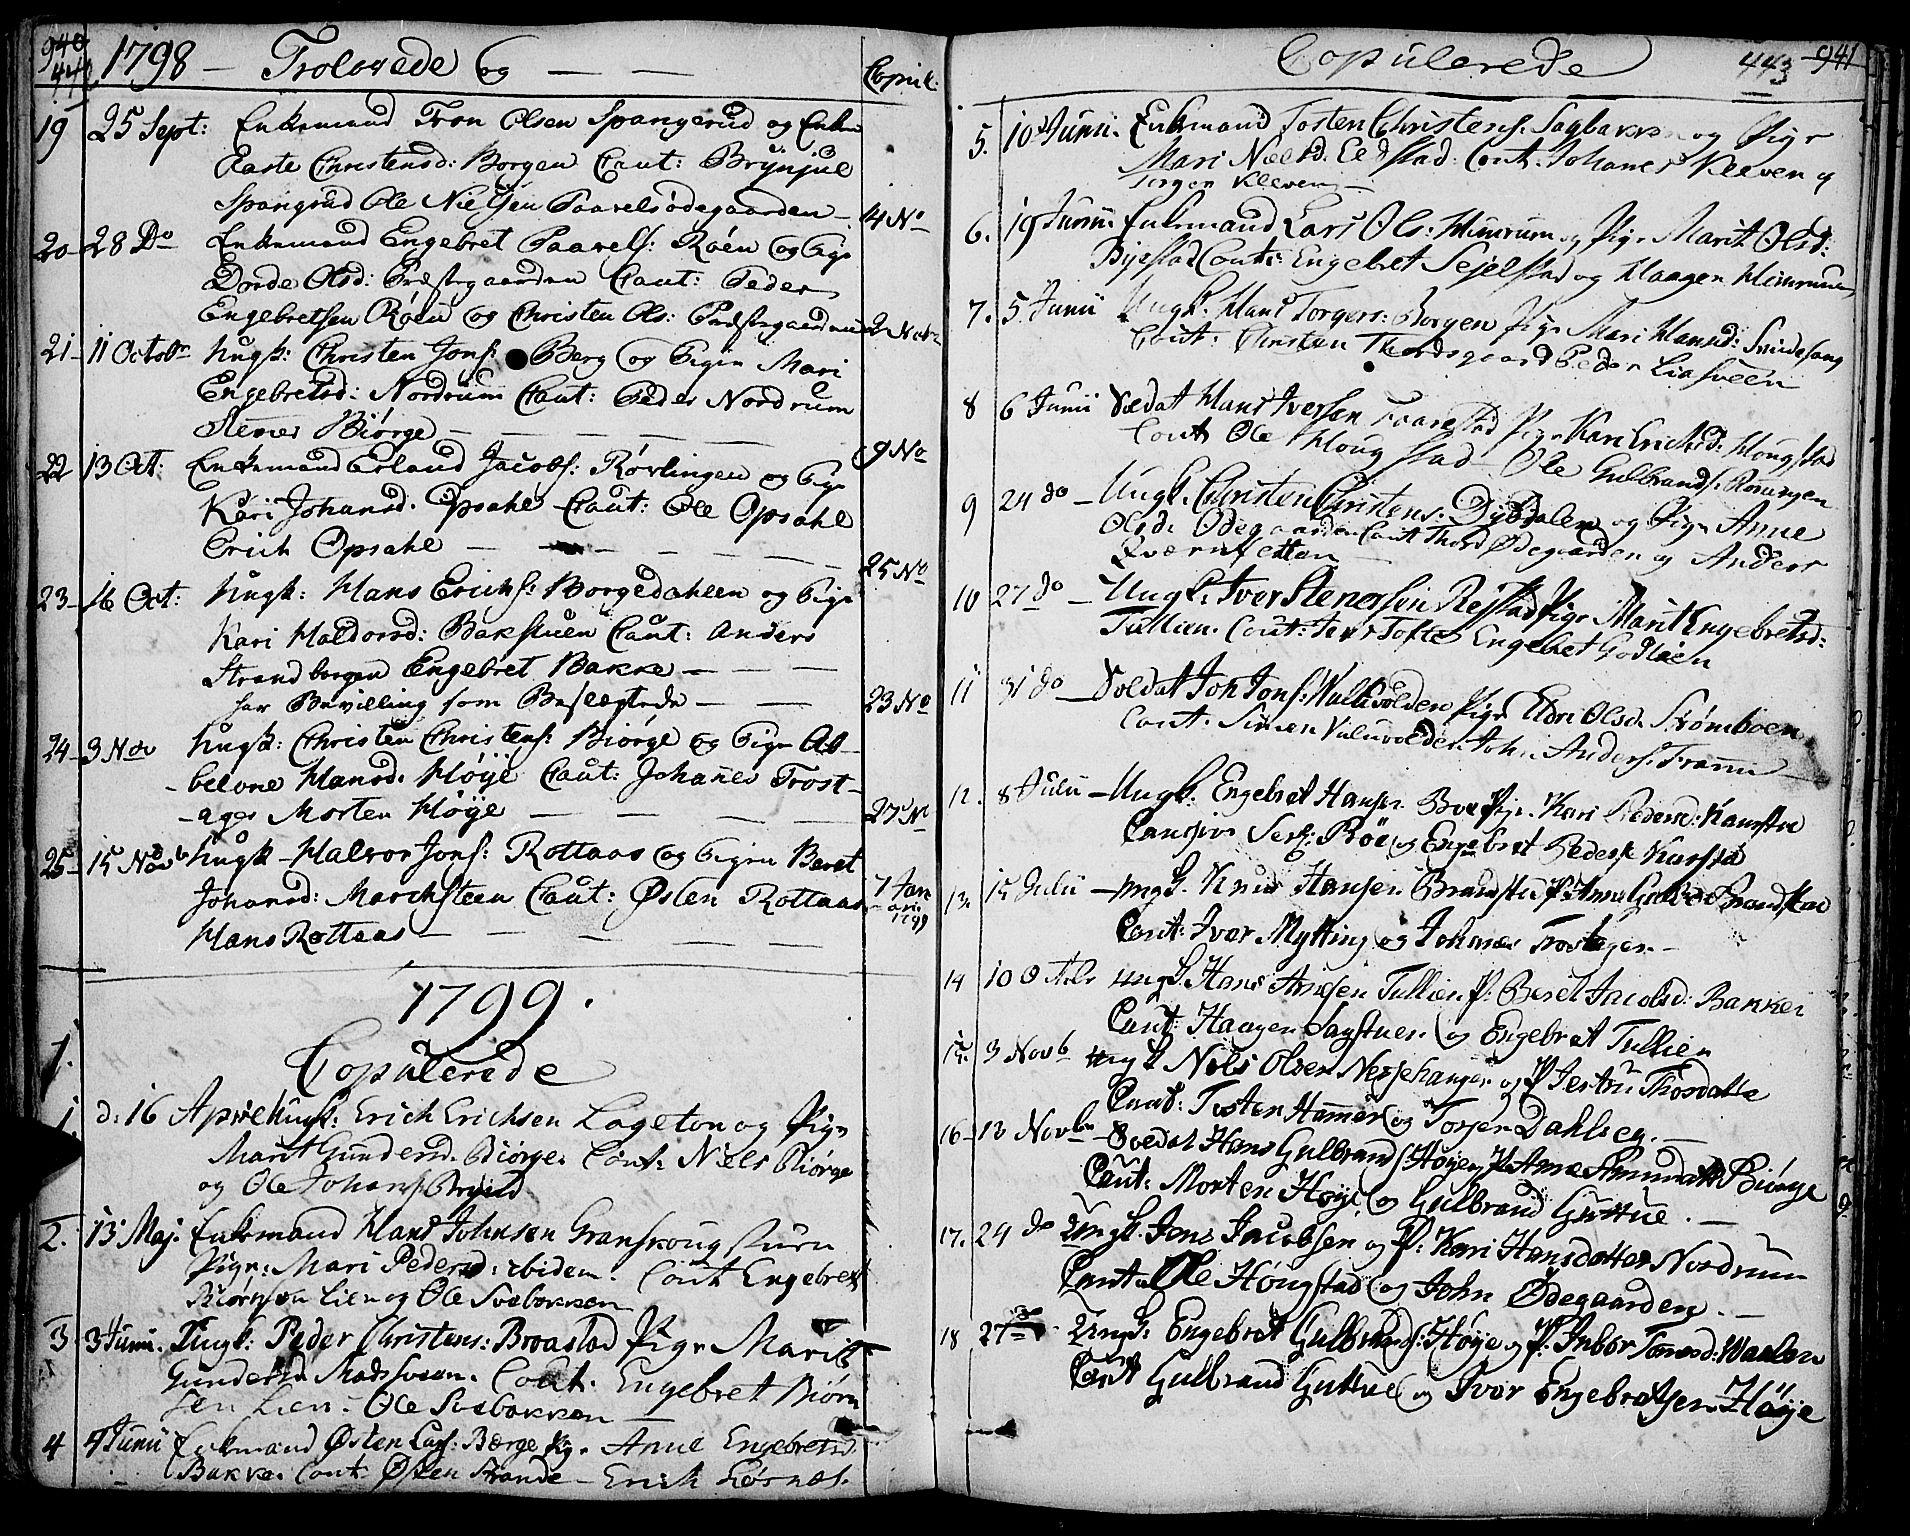 SAH, Ringebu prestekontor, Ministerialbok nr. 3, 1781-1820, s. 442-443